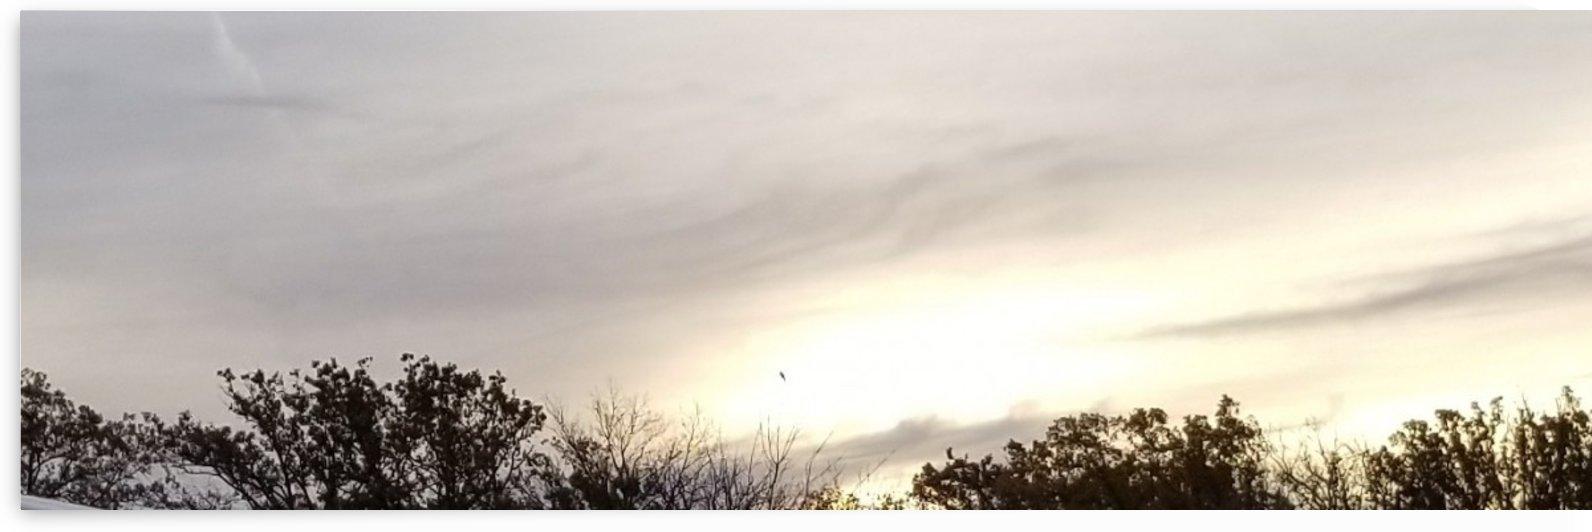 sunrise over work by Wendy A Rohn